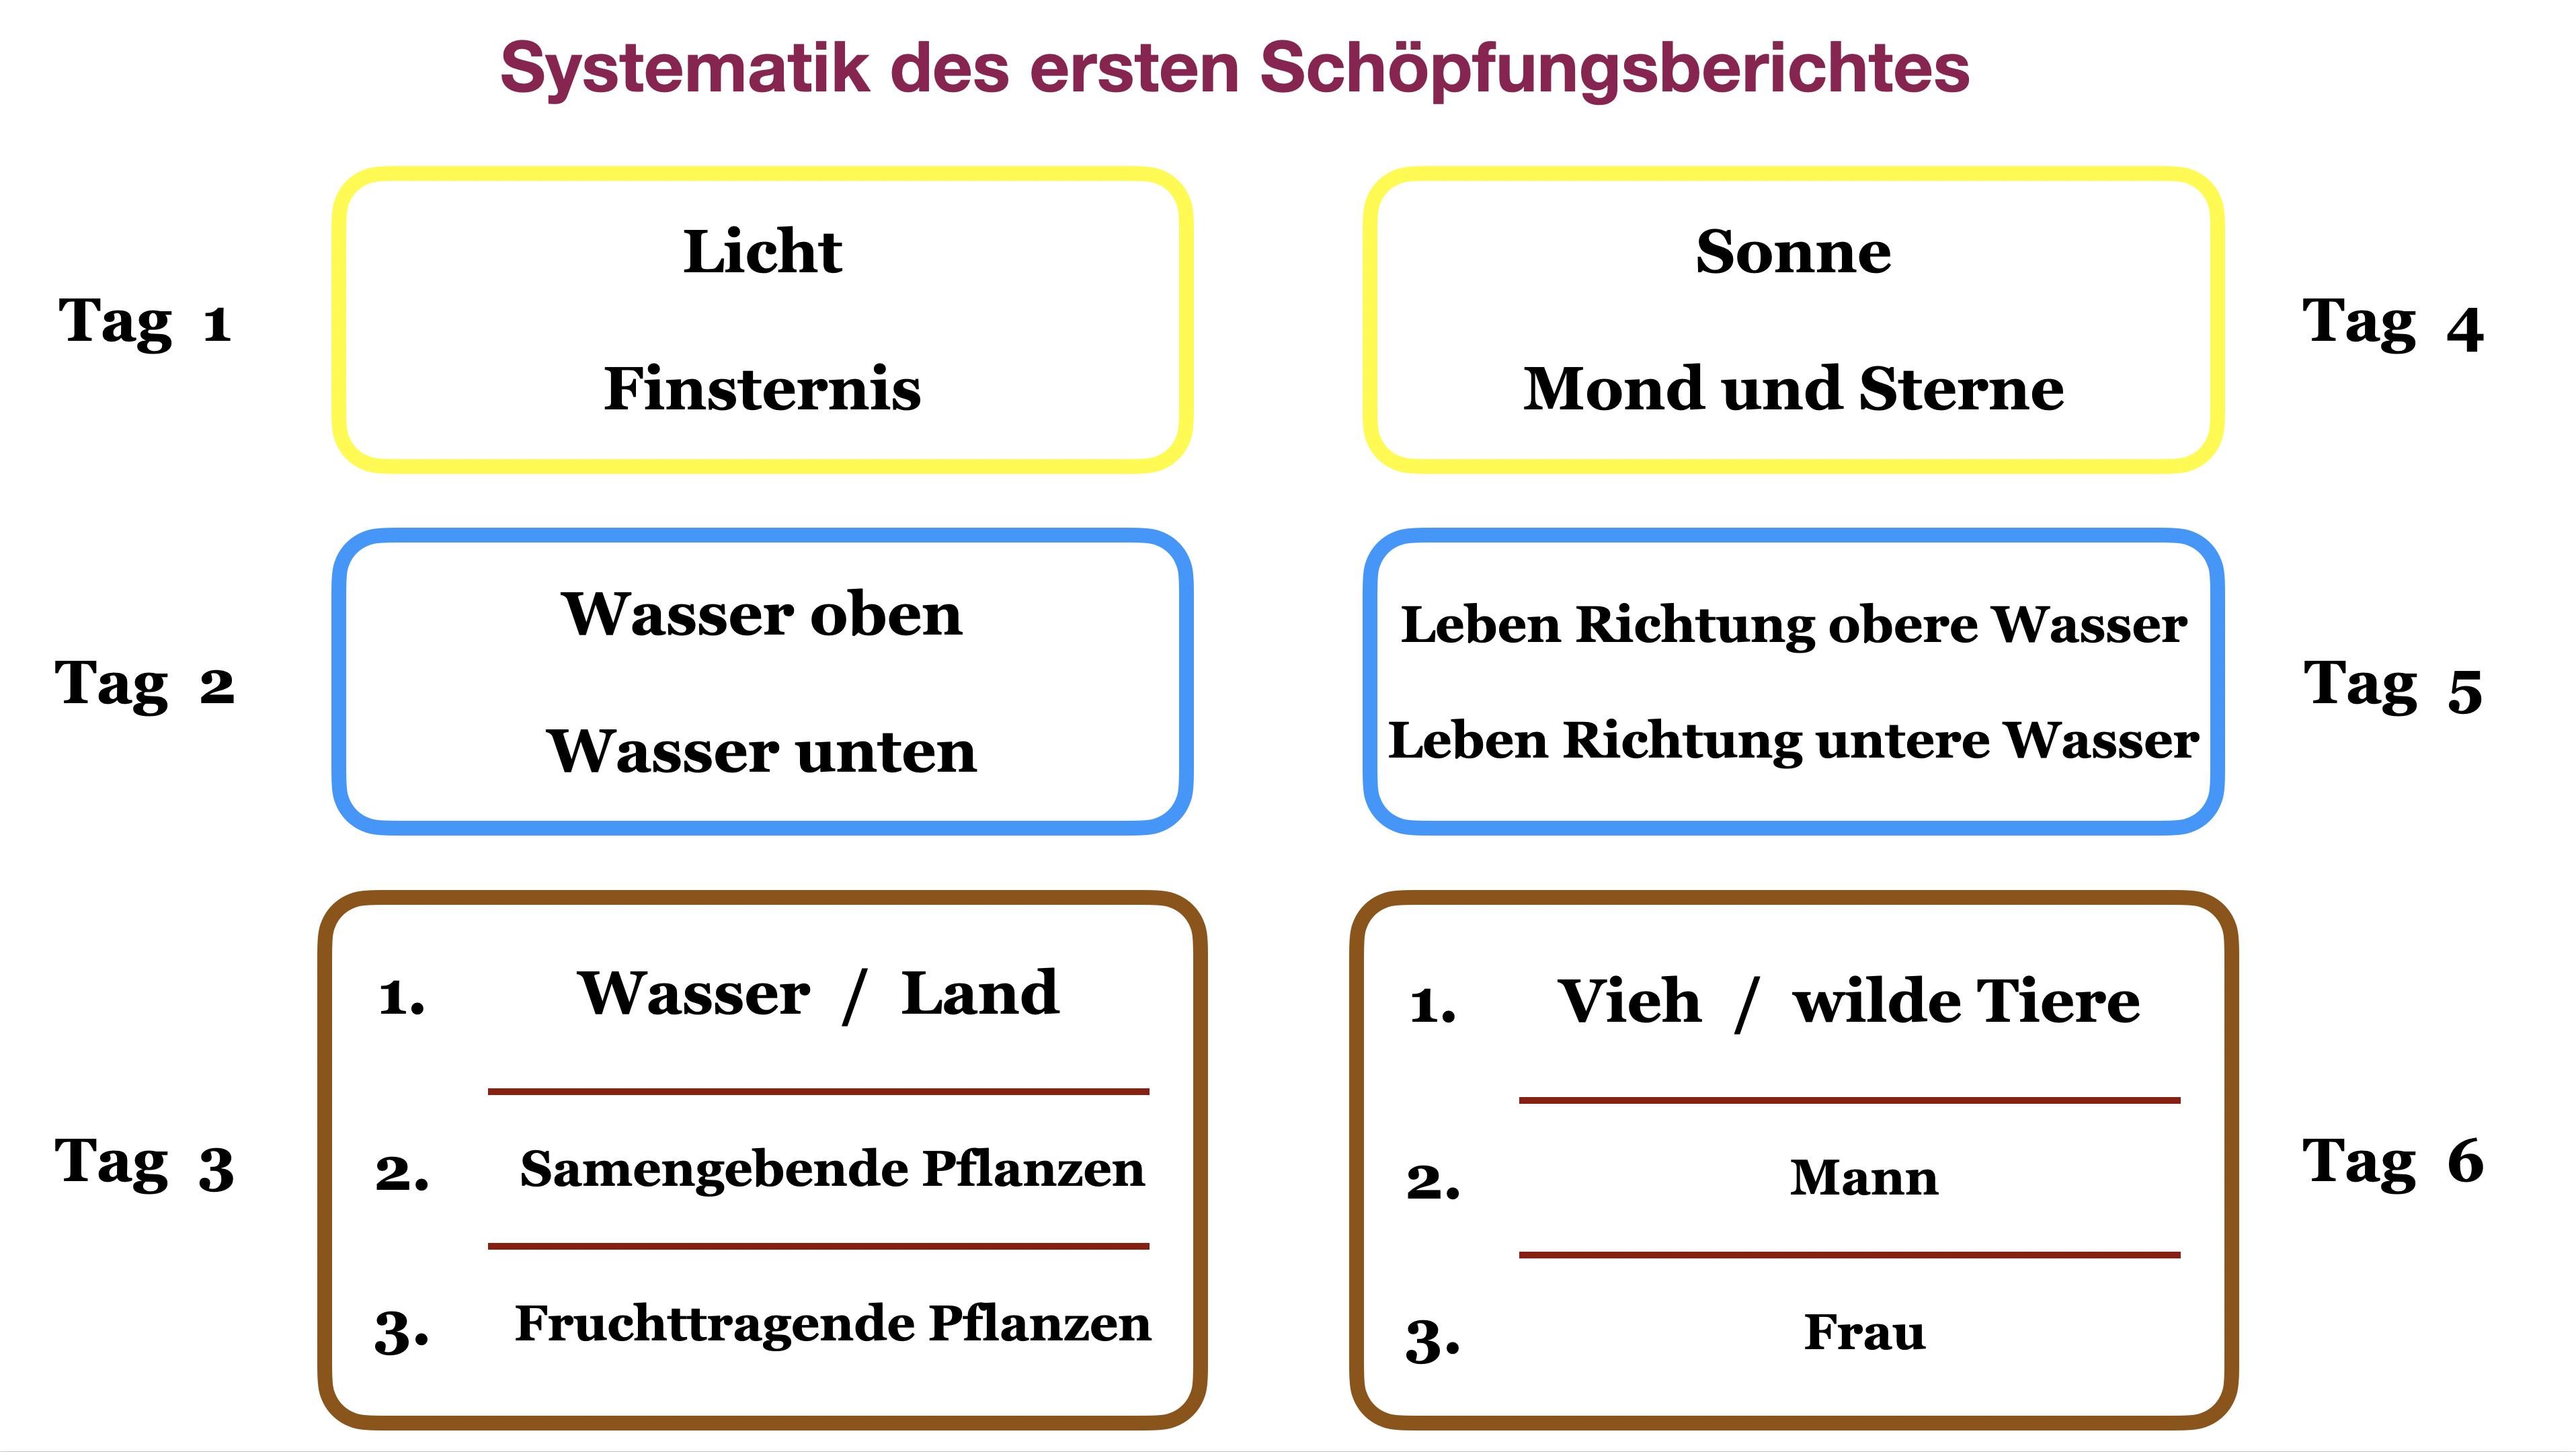 Systematik Genesis